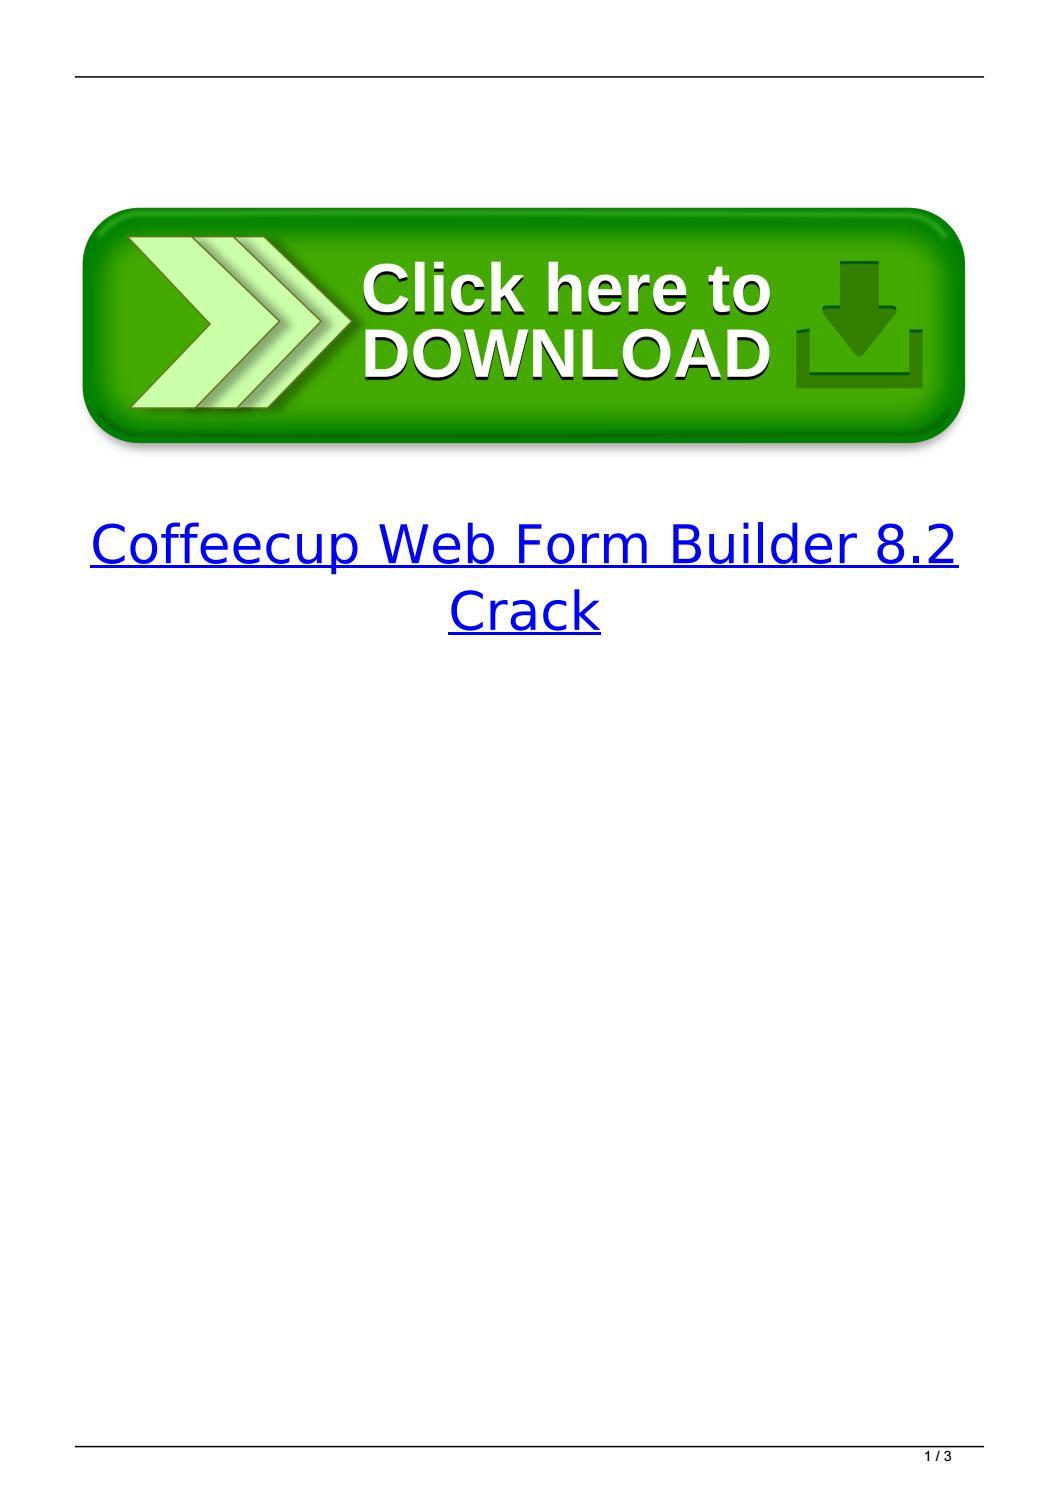 Coffeecup Web Form Builder Lite 2.5 Crack